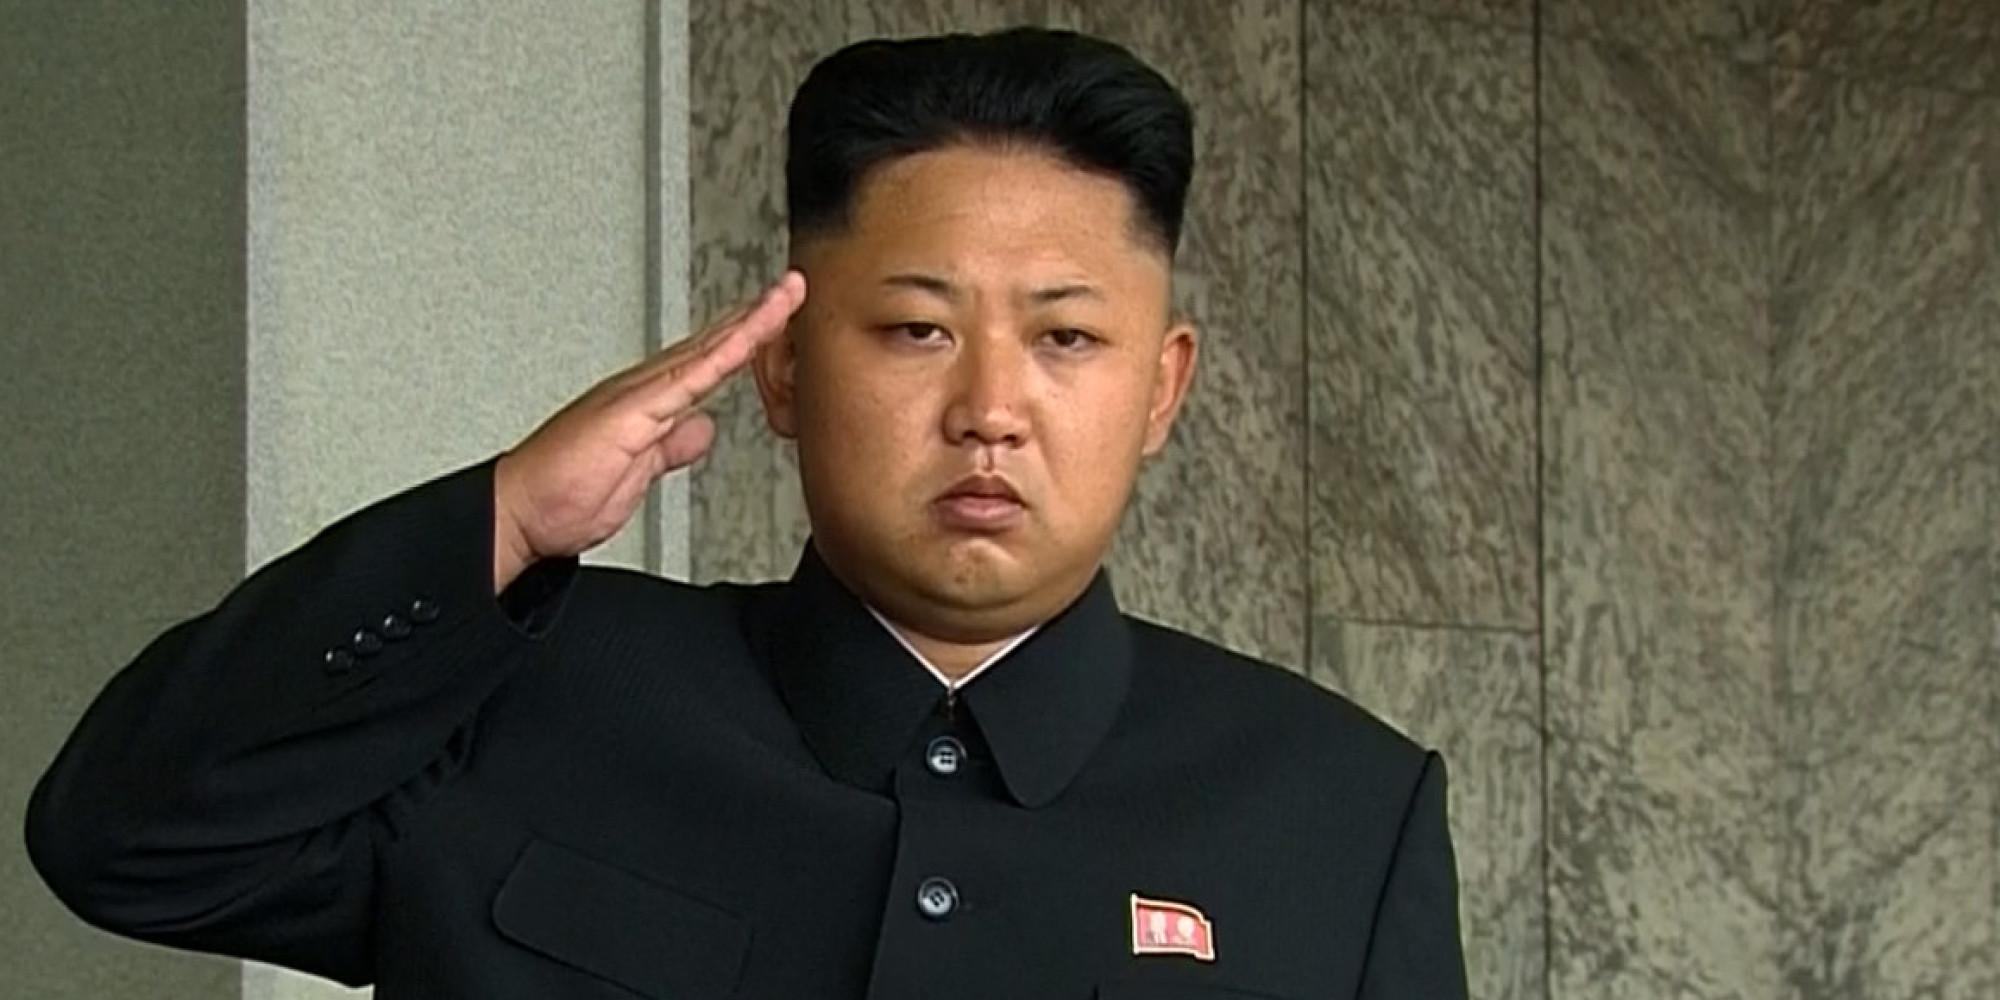 President Kim Jong-un - age: 38